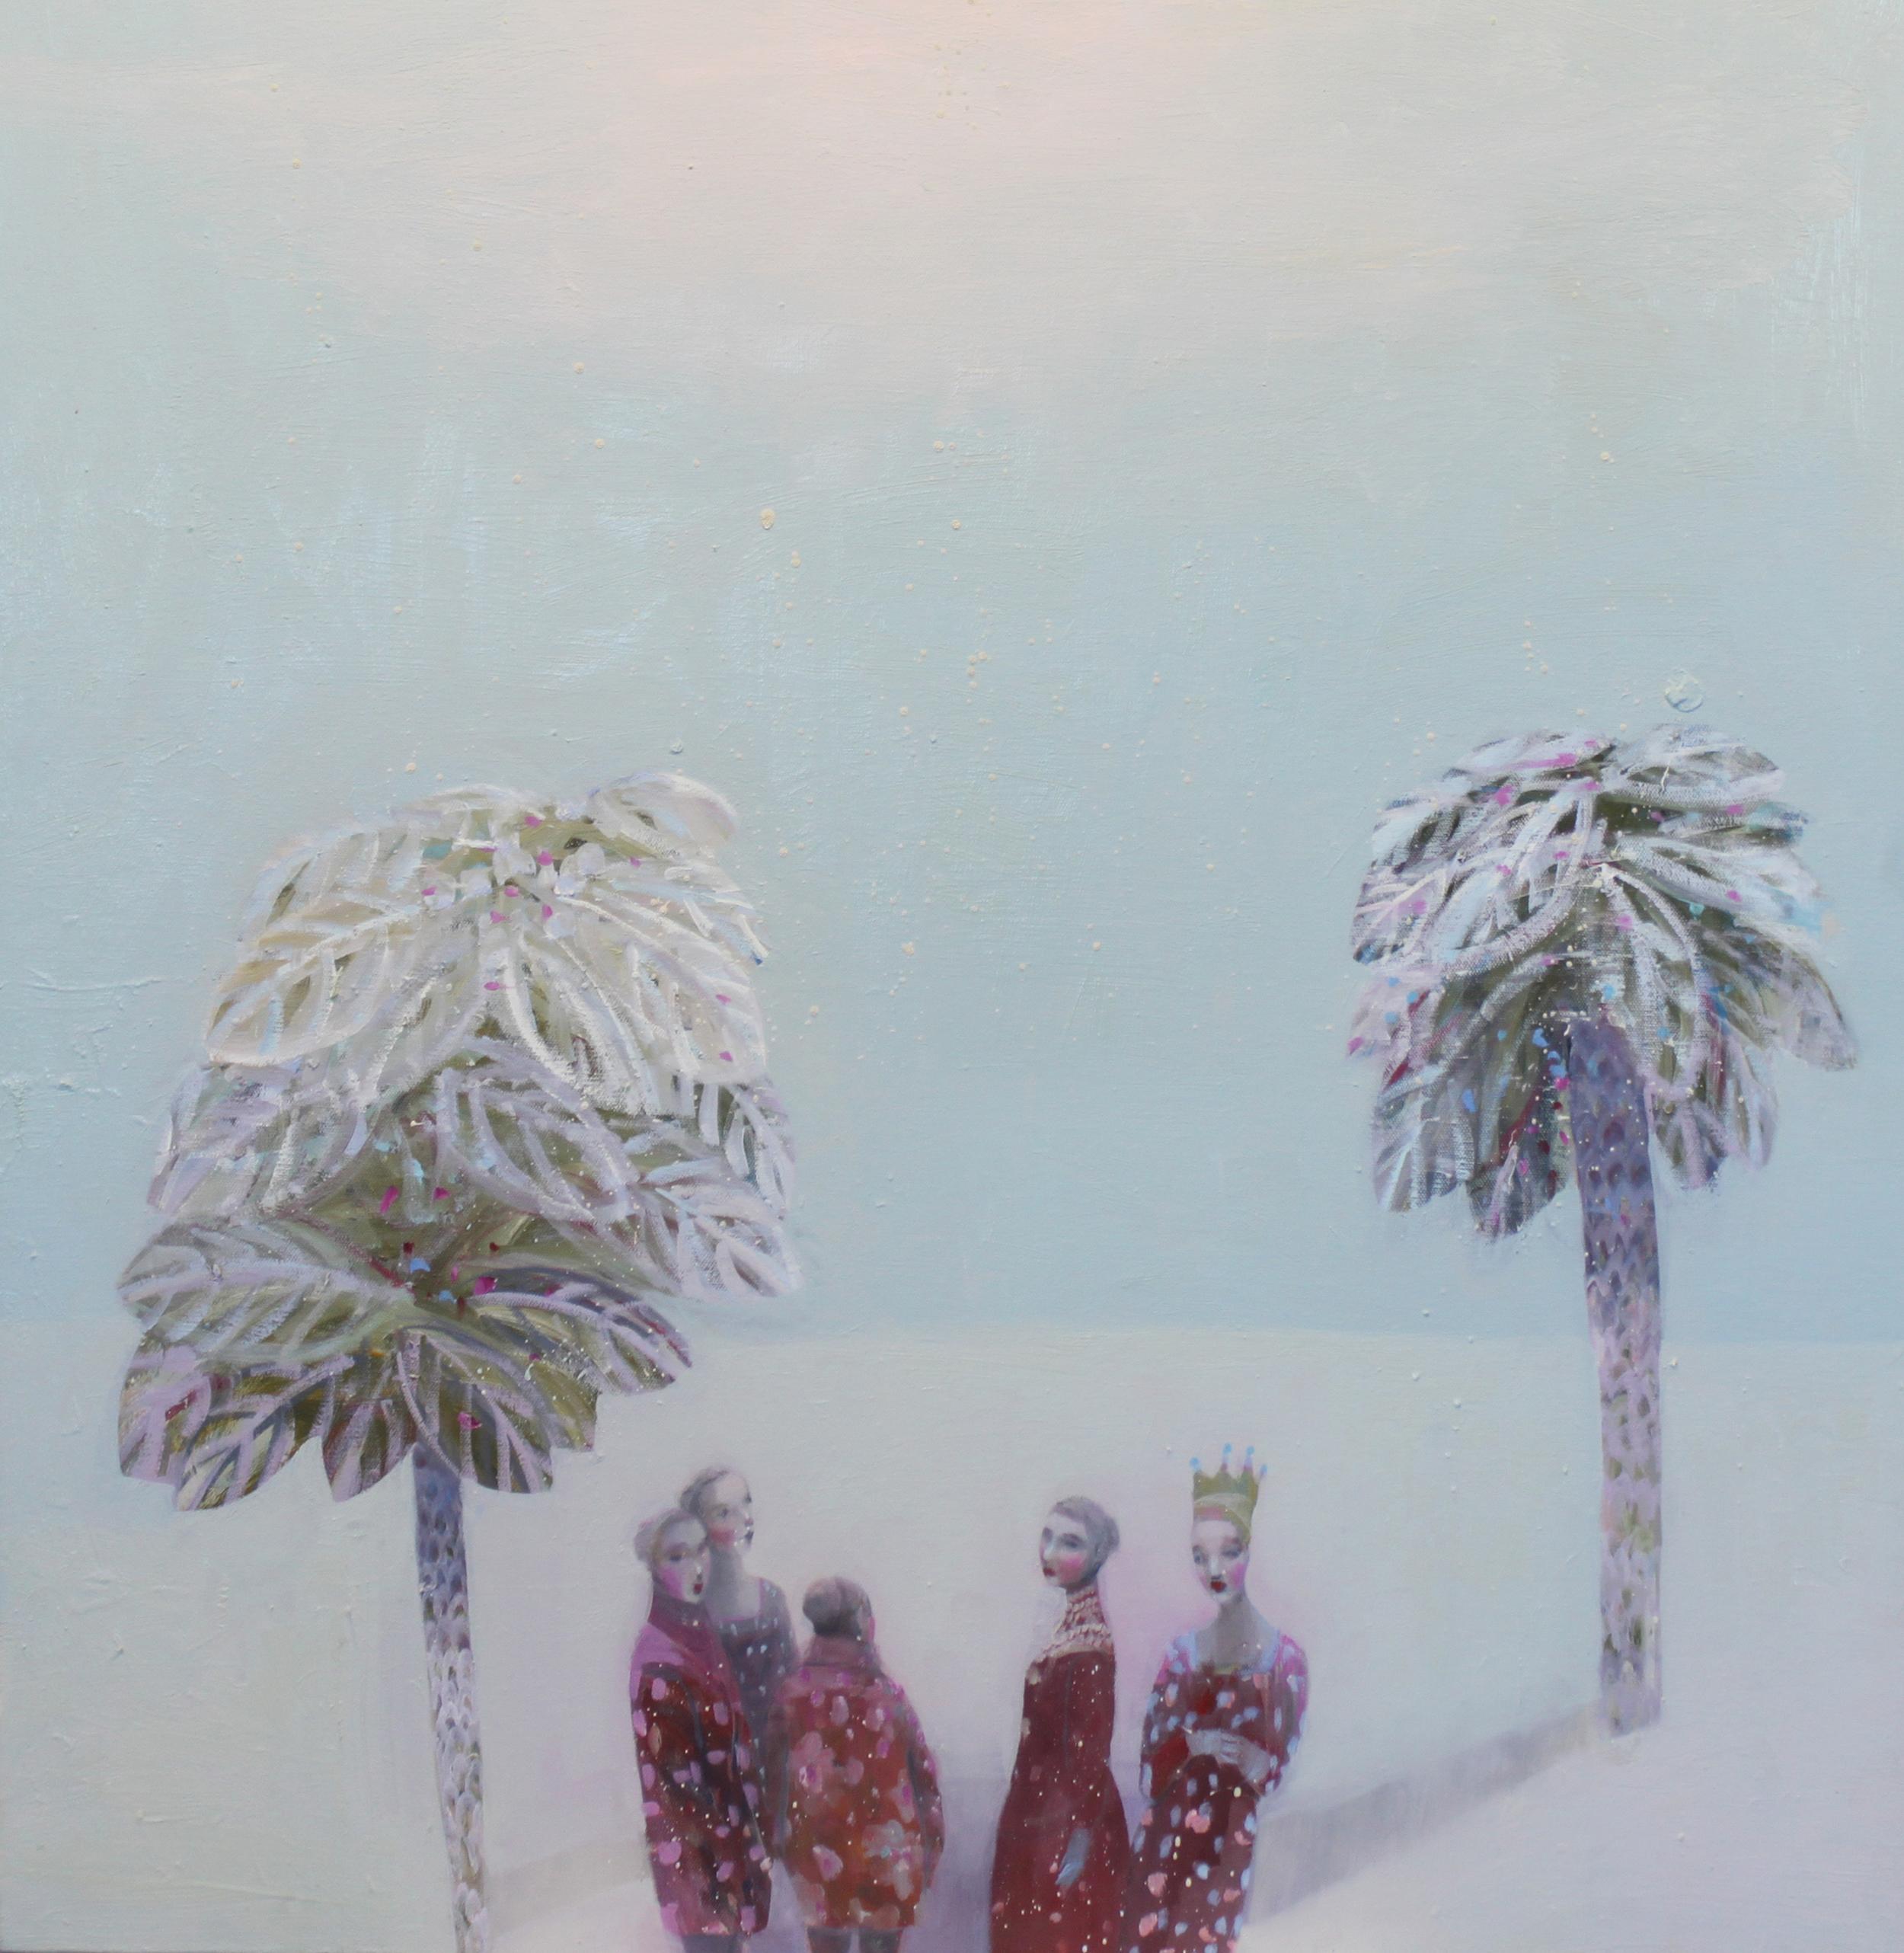 K r i s t i n V e s t g a r d  Utflukt 80 x 80 cm oil on canvas £3500